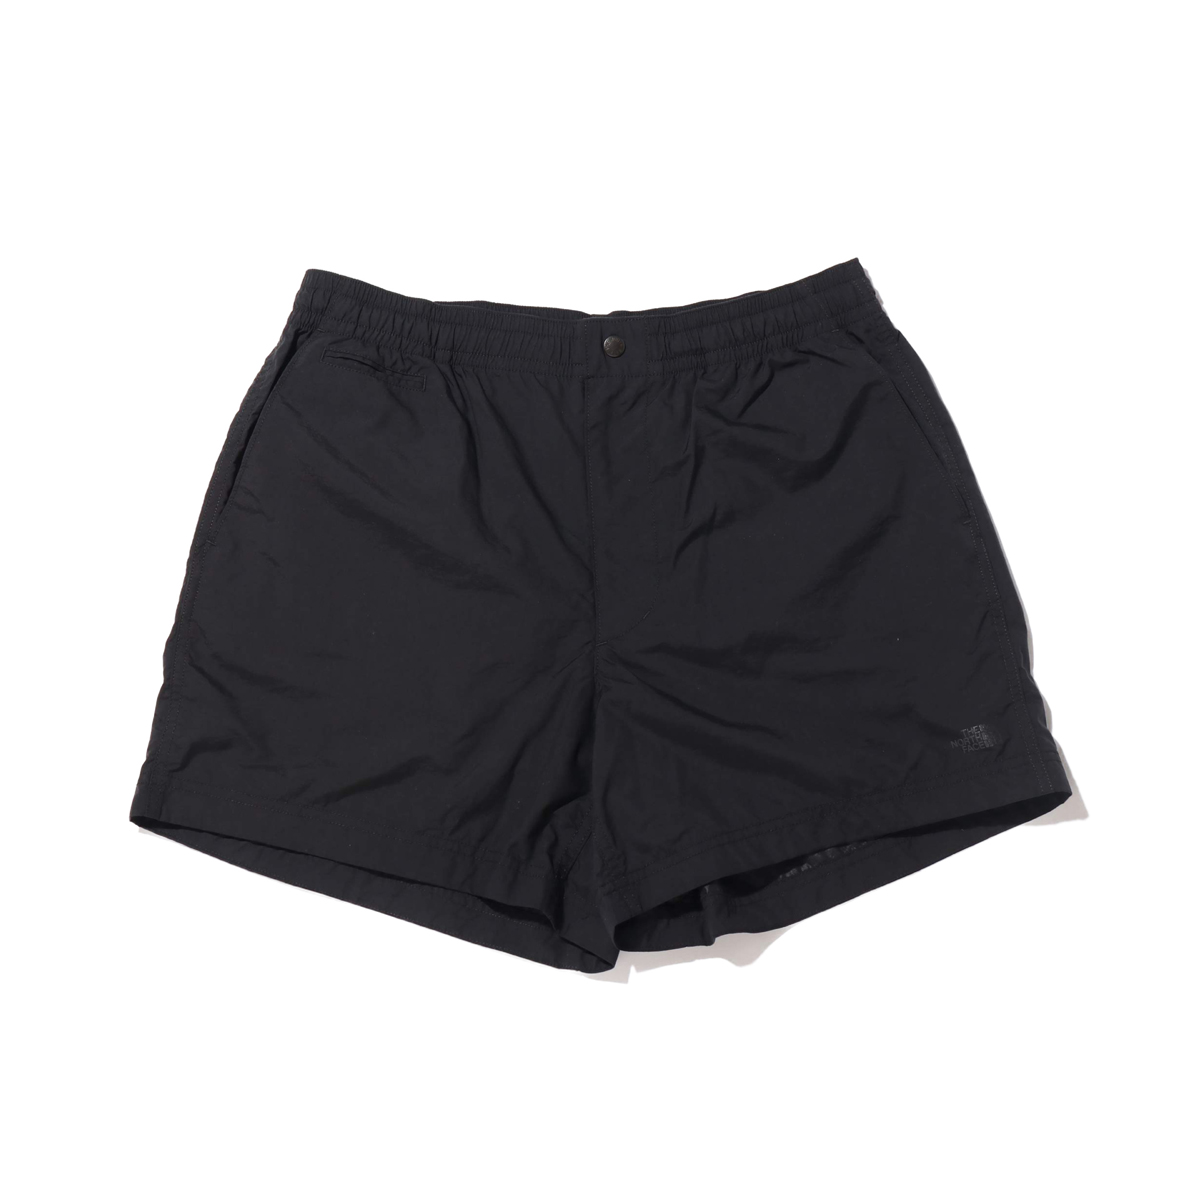 THE NORTH FACE PURPLE LABEL Mountain Field Shorts(BLACK)(ザ・ノース・フェイス パープルレーベル マウンテンフィルドショーツ)【メンズ】【ハーフパンツ】【20SS-I】